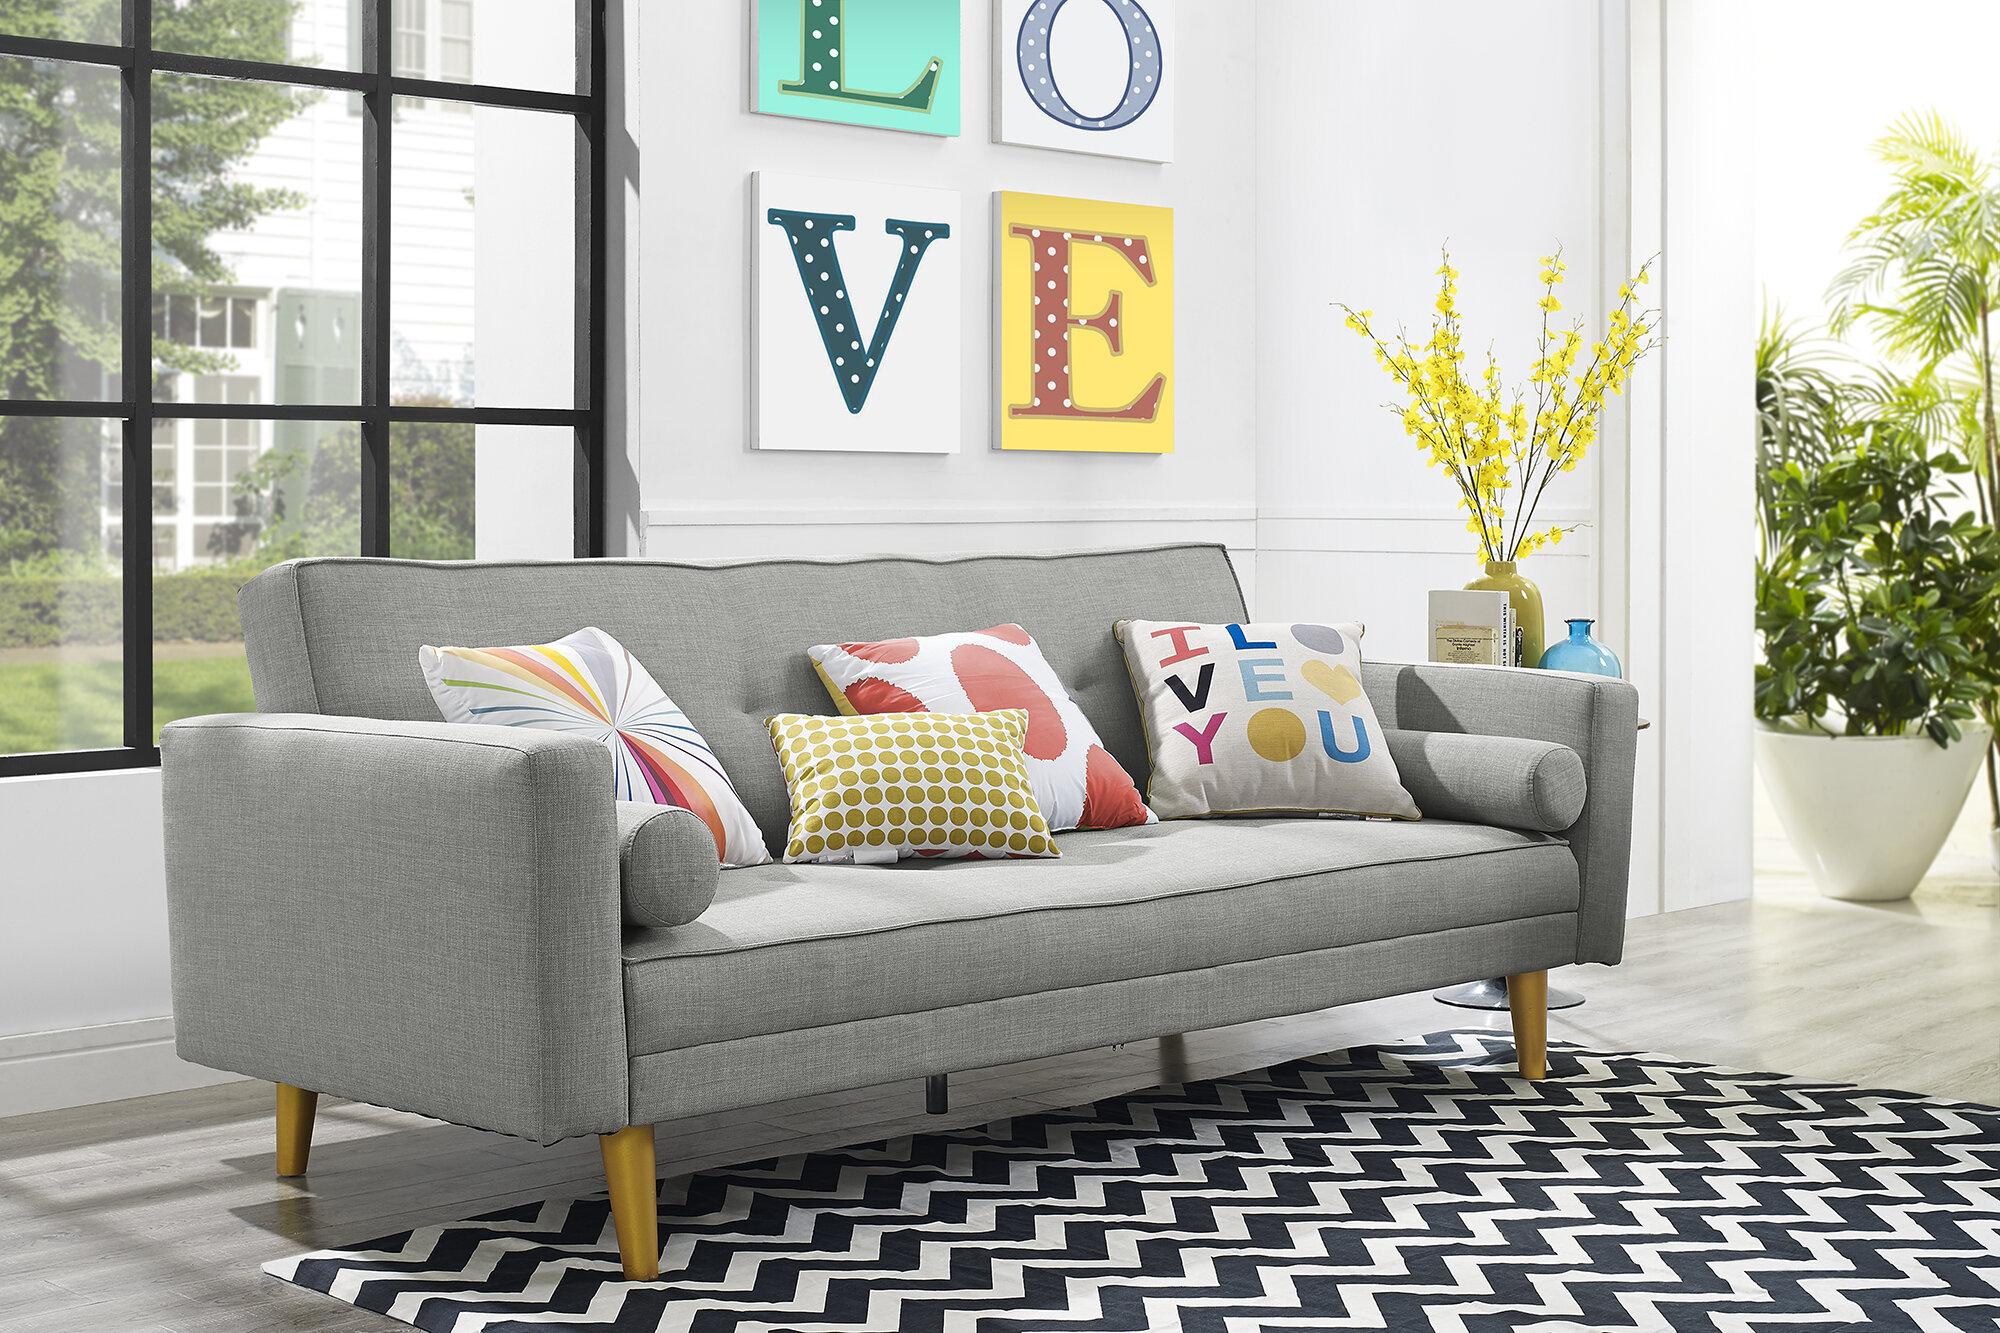 Awesome Novogratz Vintage Mix Convertible Sofa Andrewgaddart Wooden Chair Designs For Living Room Andrewgaddartcom